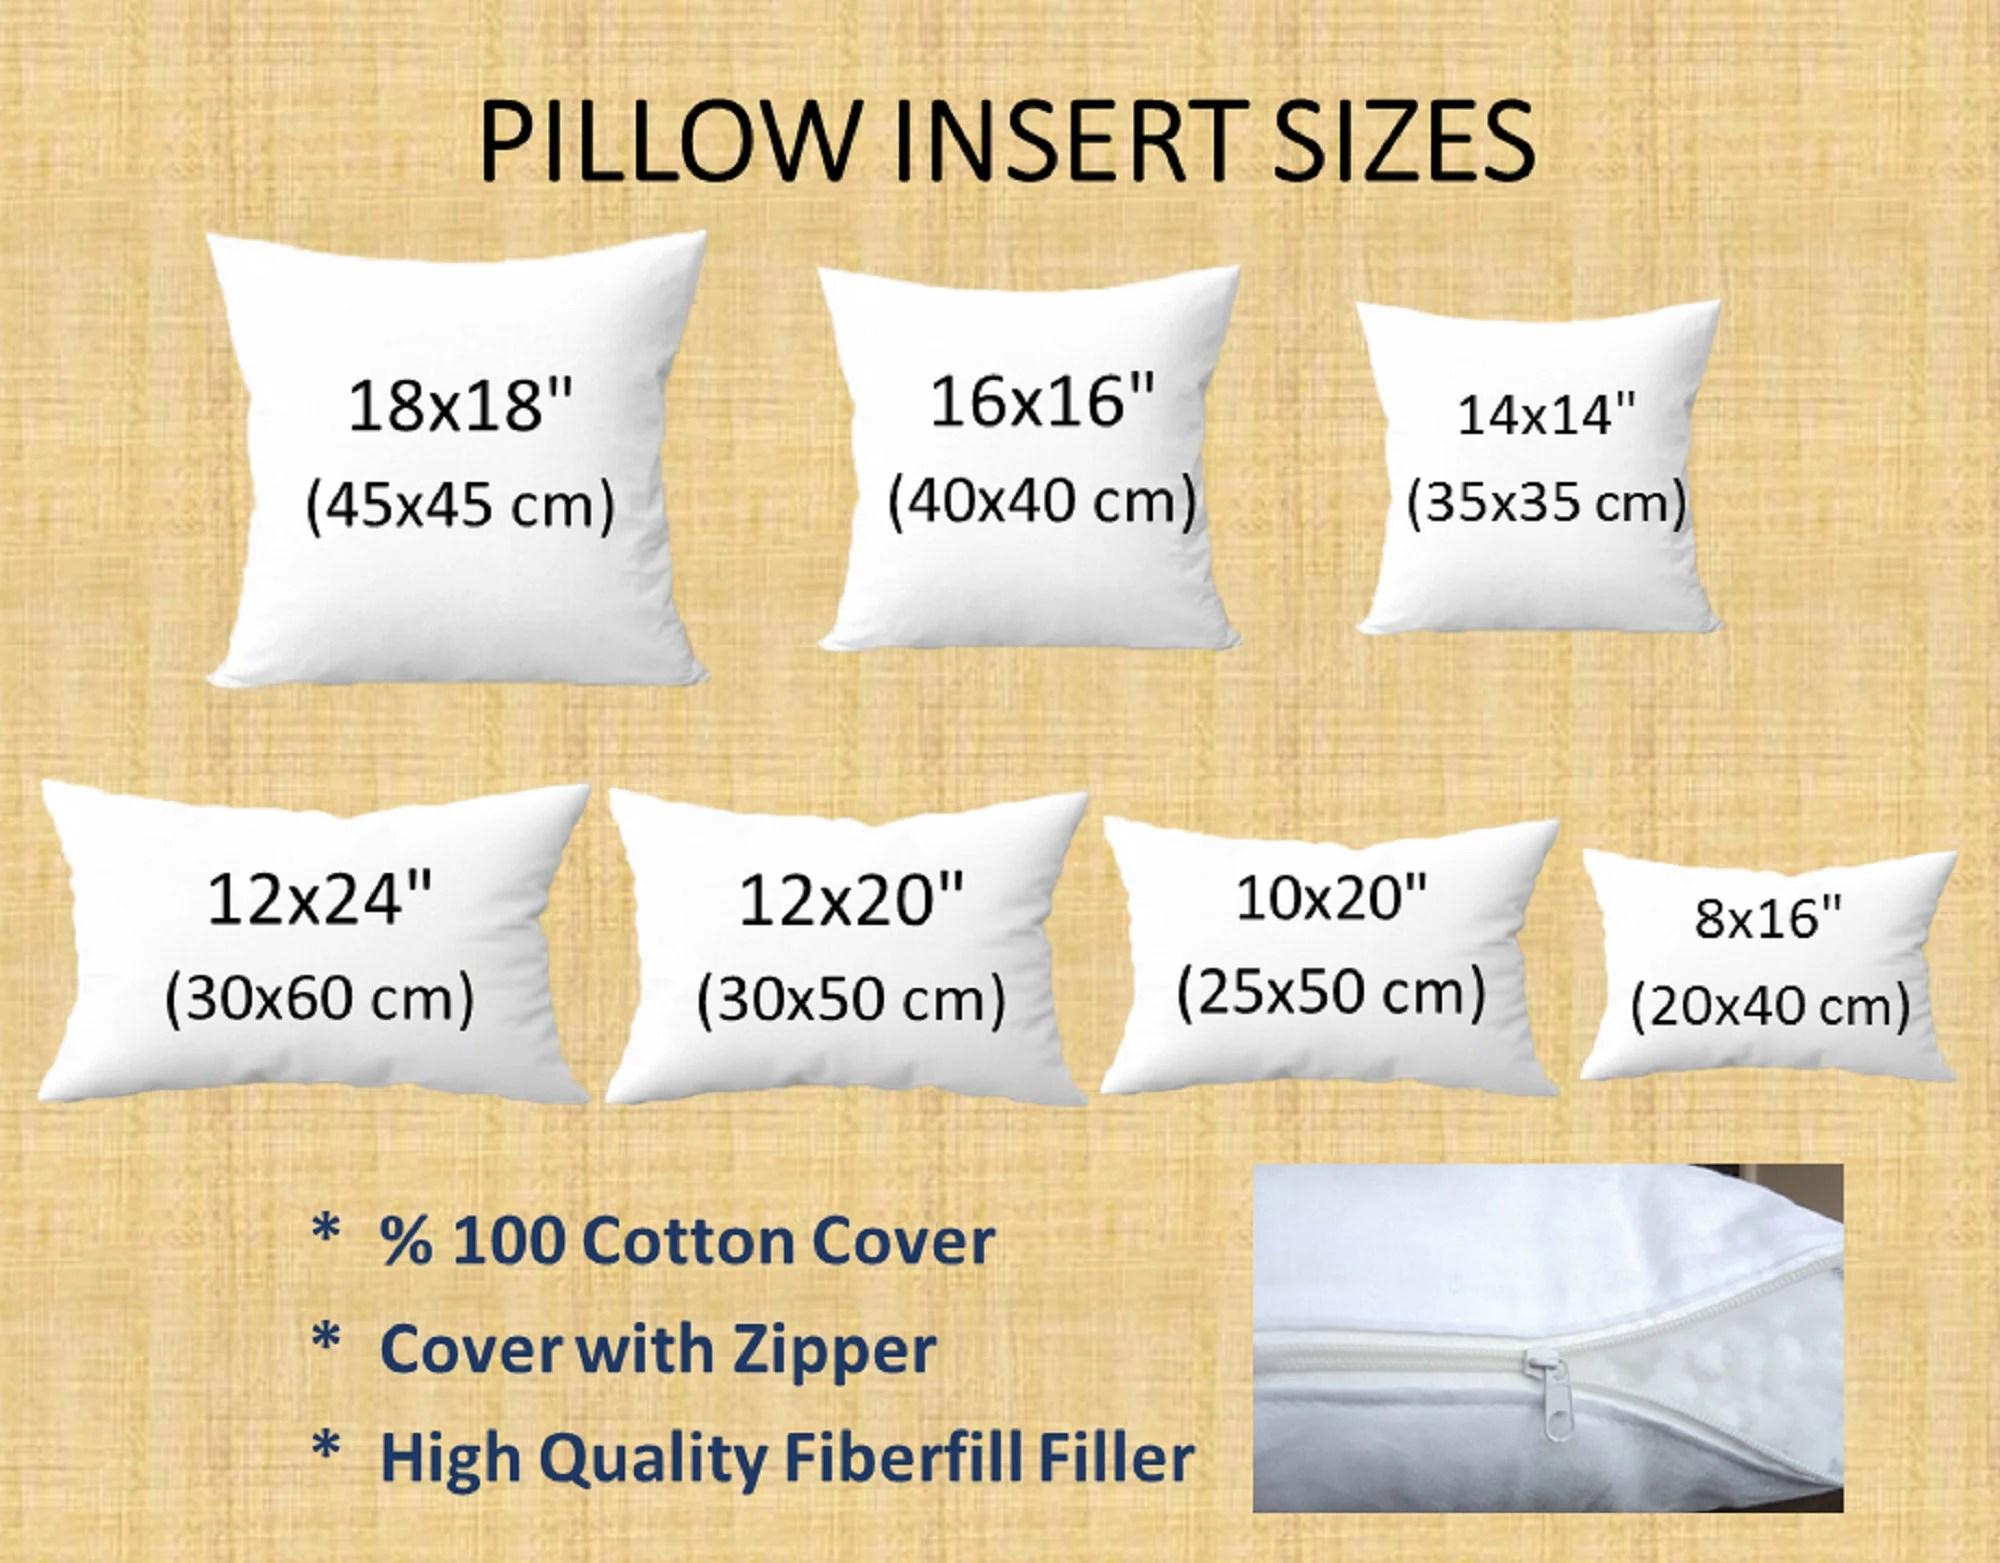 8x16 pillow insert etsy